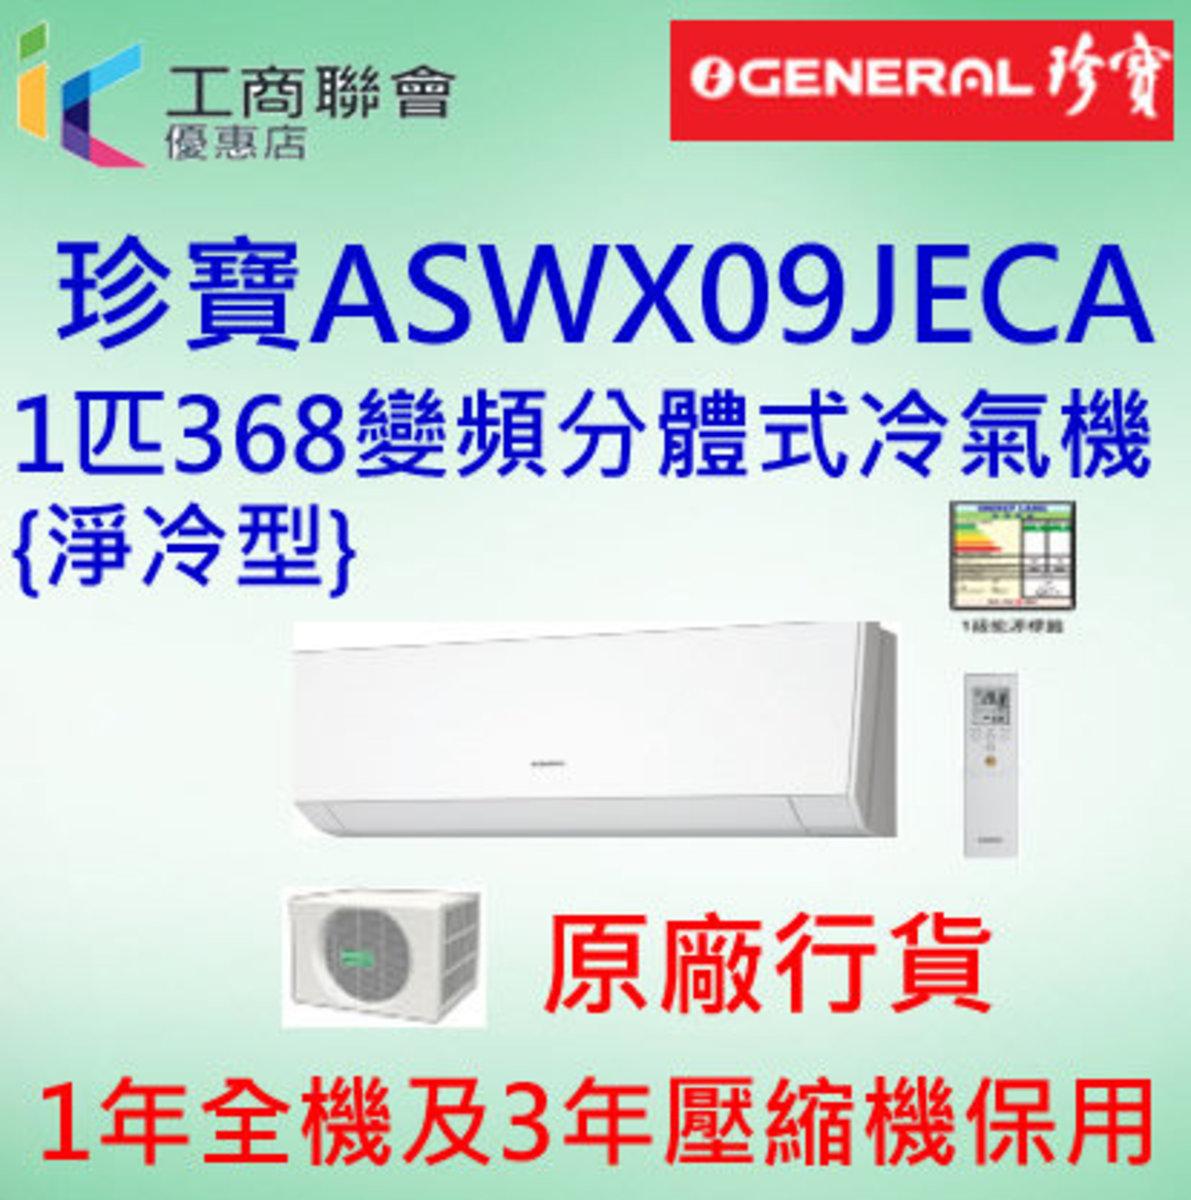 ASWX09JECA 368 1 (net cold) frequency conversion window split type